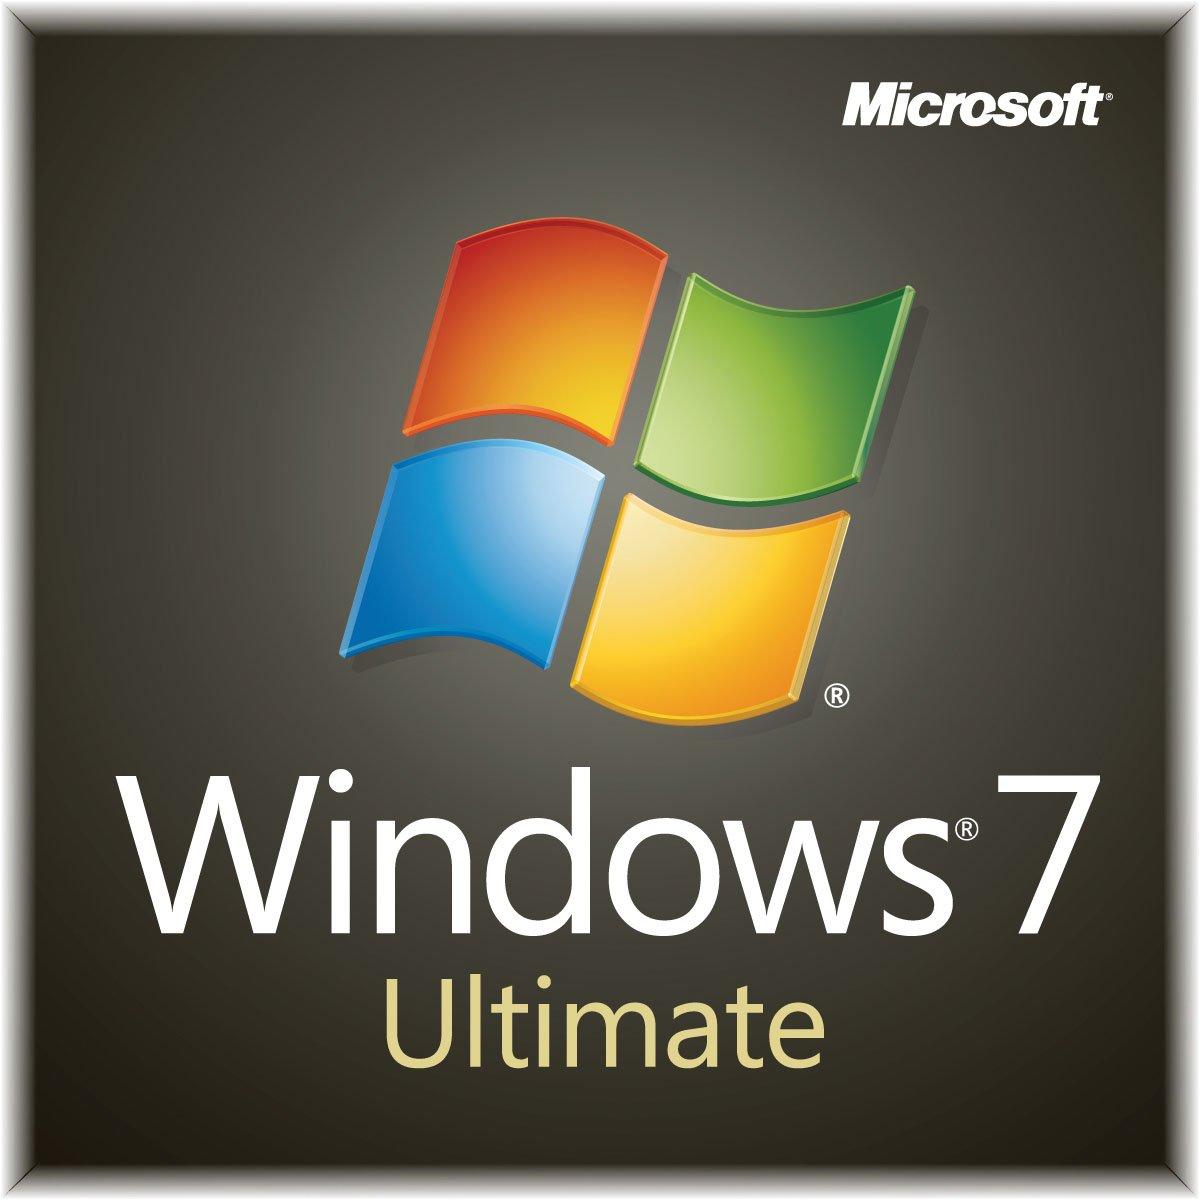 Windows 7 Ultimate SP1 64bit (Full) System Builder OEM DVD 1 Pack [Old Packaging] by Microsoft